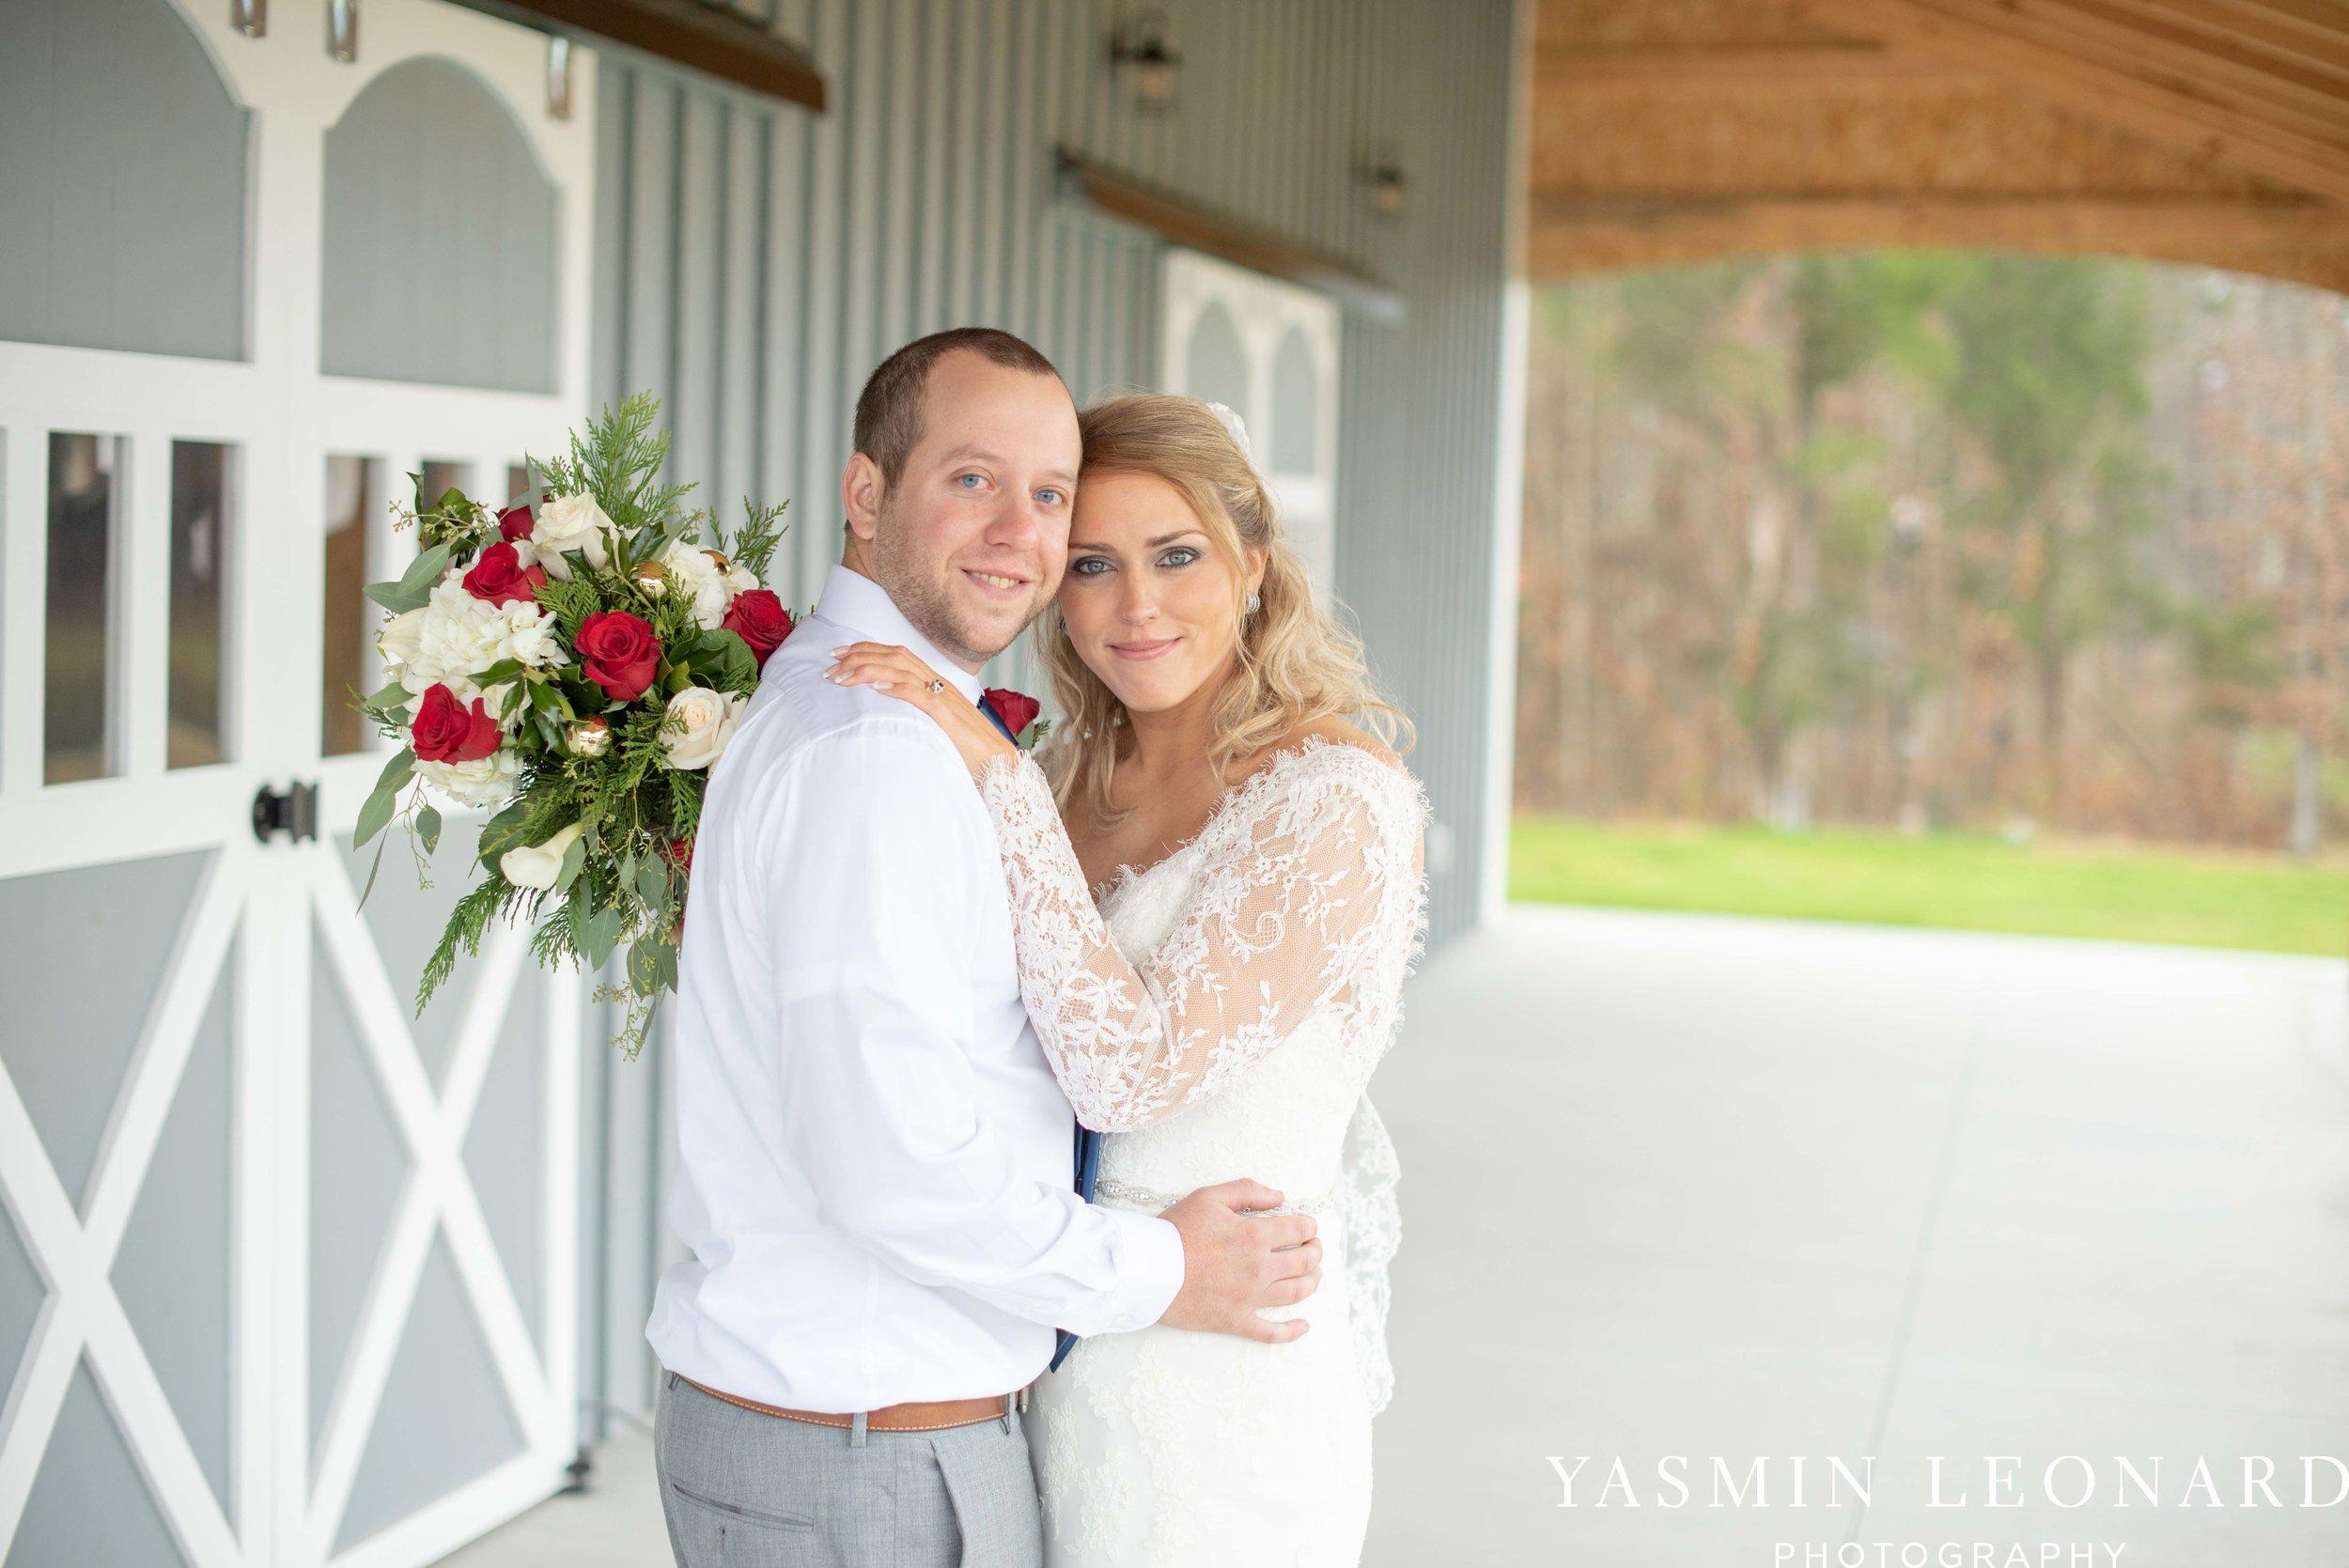 Secret Meadows at Green Dell Farm, NC Barns, NC Wedding Venues, Triad, NC, NC Wedding Photography, Triad Wedding Venues, Affordable Wedding Venues, NEW Wedding Venues, Christmas Weddings-29.jpg